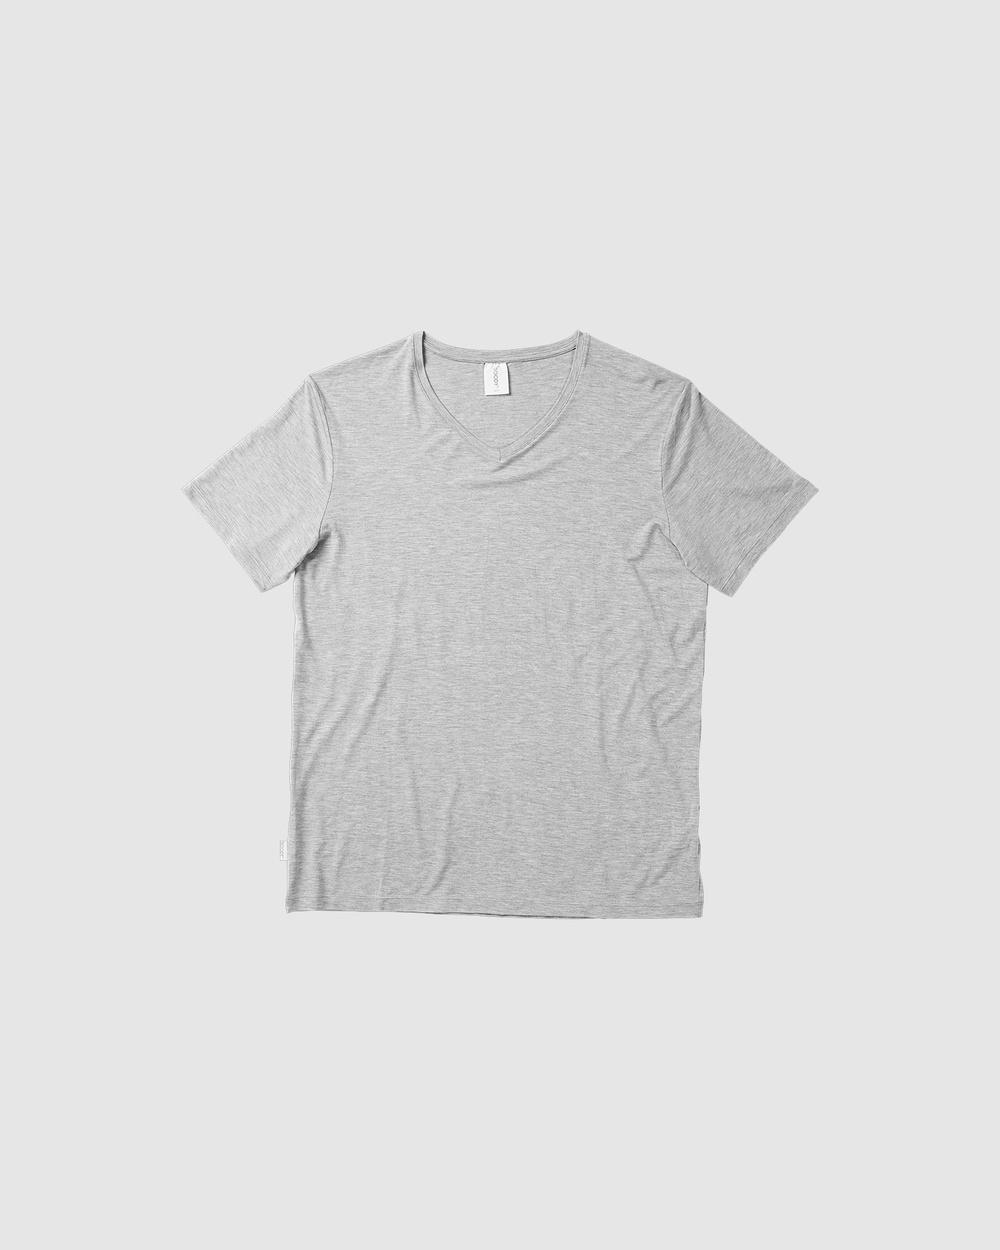 Boody Organic Bamboo Eco Wear - 2 Pack V Neck T Shirt - Short Sleeve T-Shirts (Multi) 2 Pack V-Neck T-Shirt